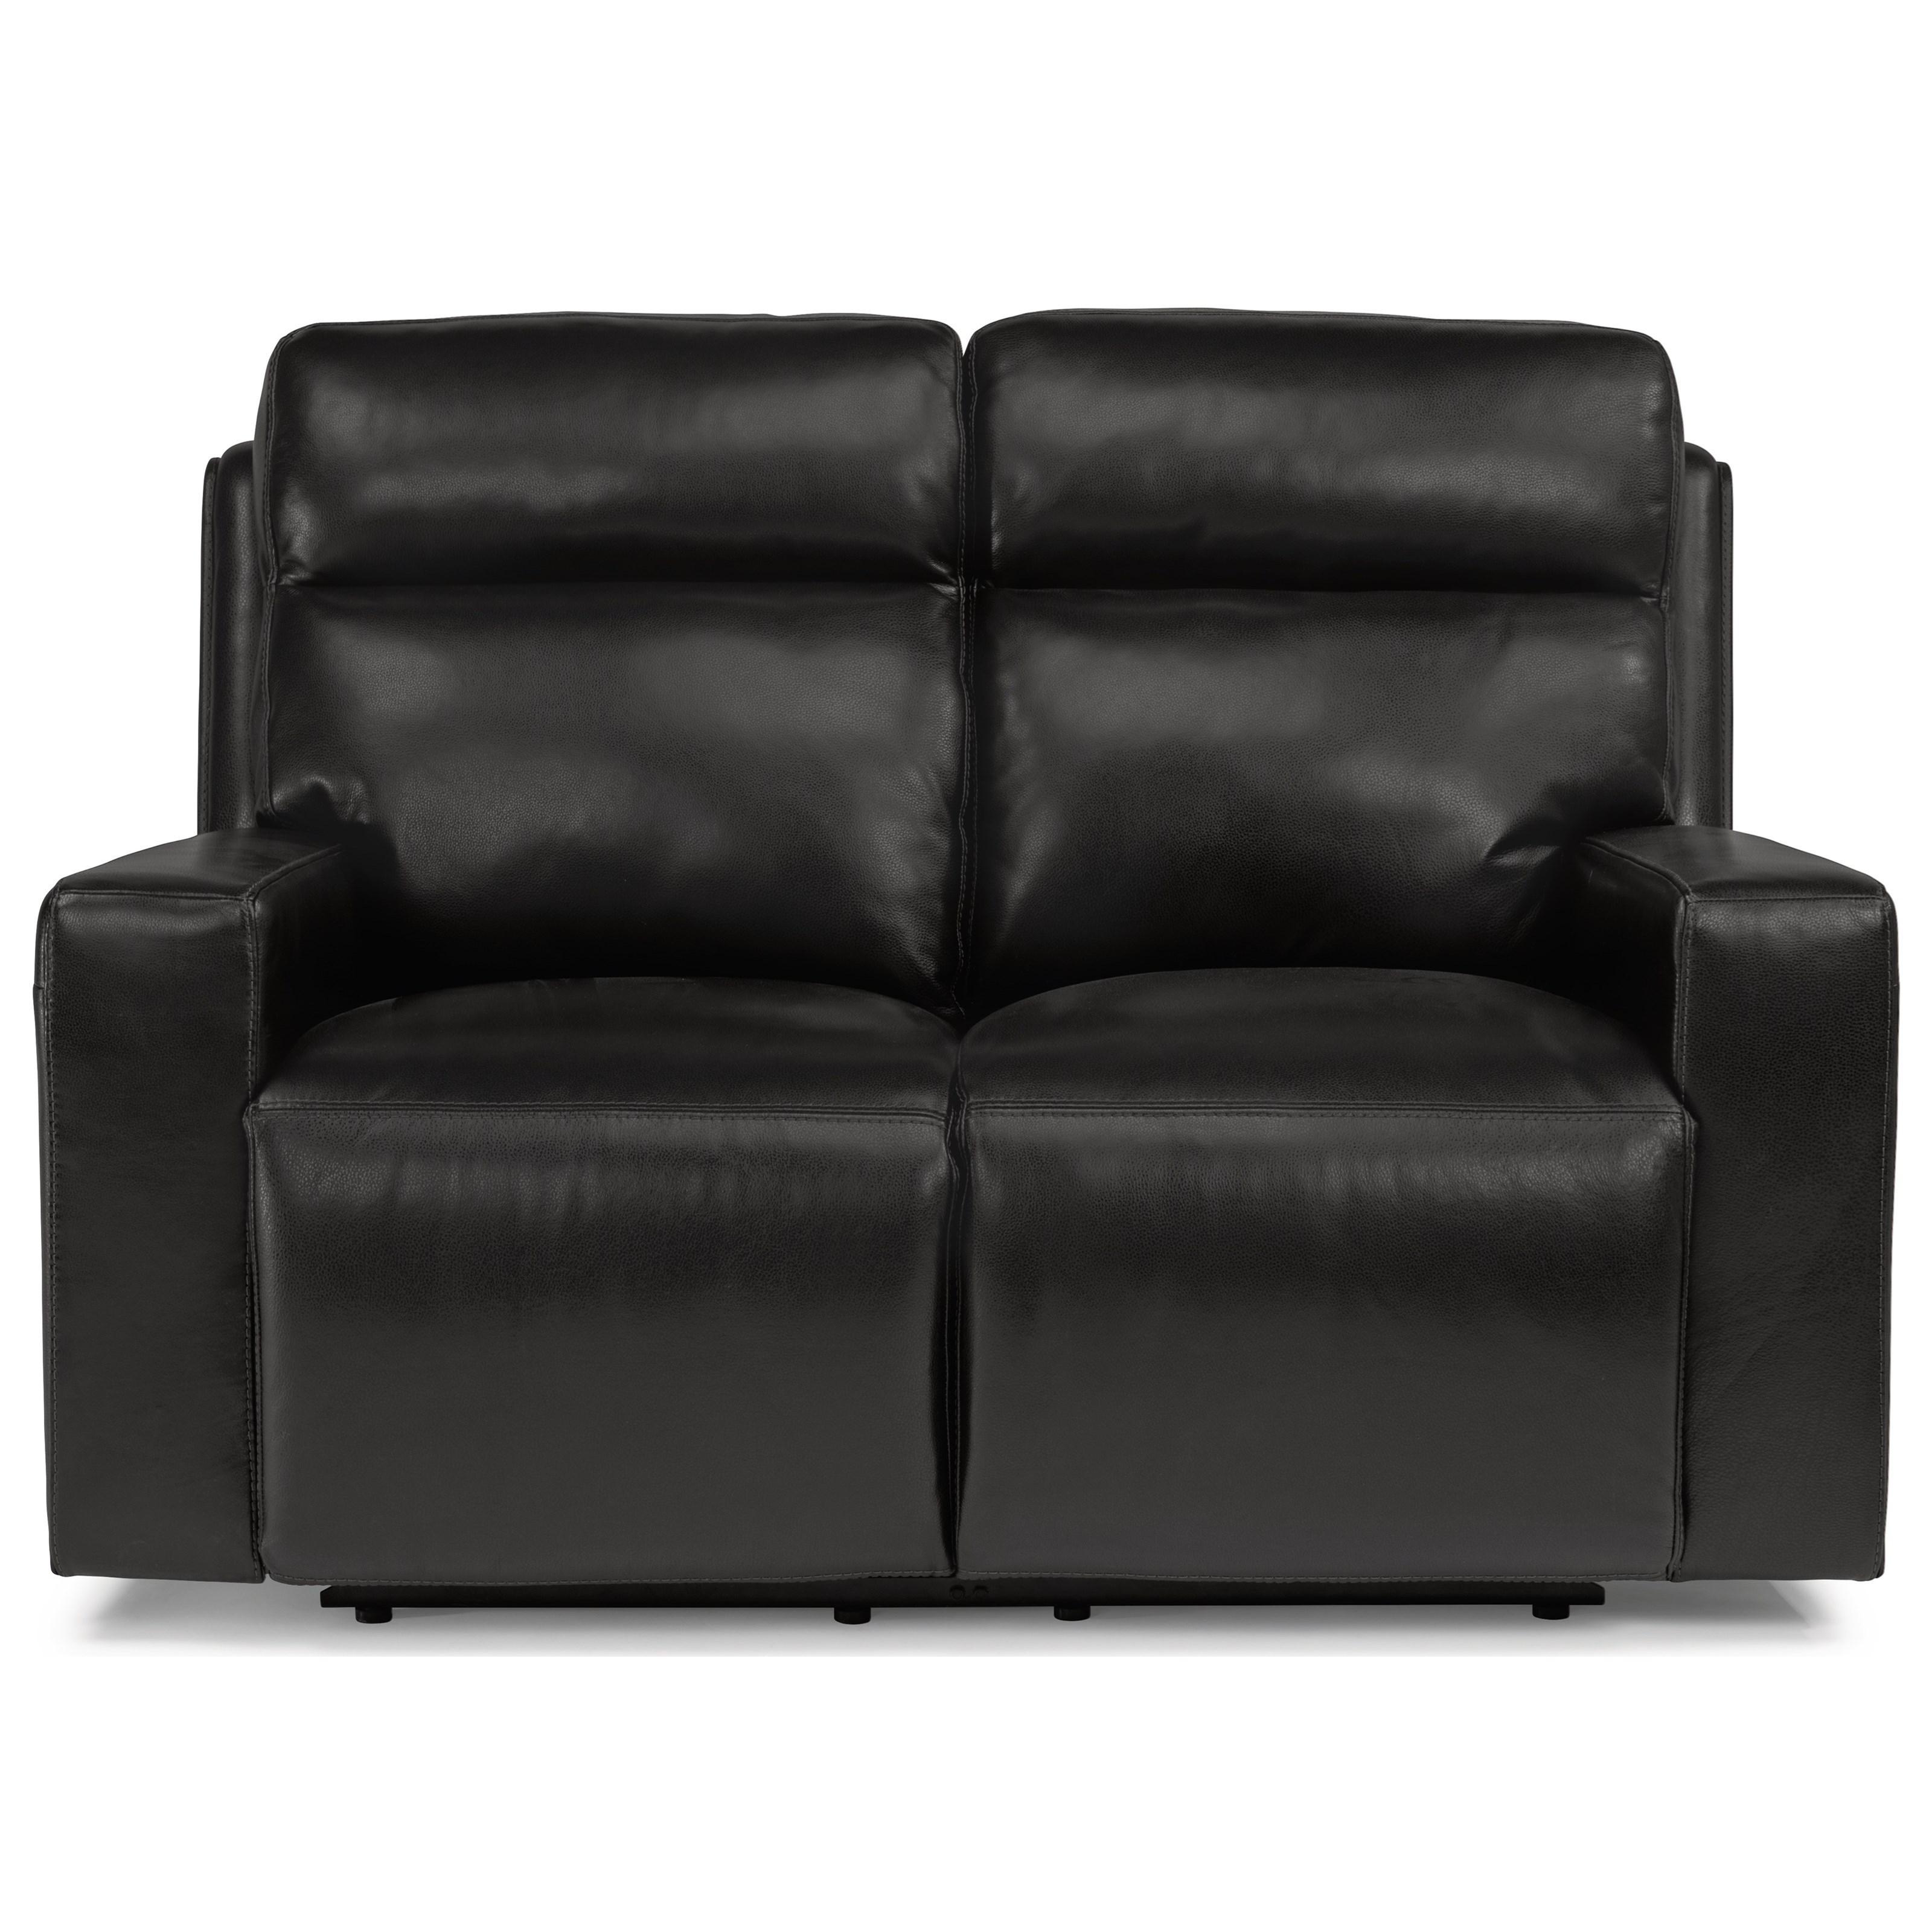 Flexsteel Electric Sofa: Flexsteel Latitudes-Niko Contemporary Power Reclining